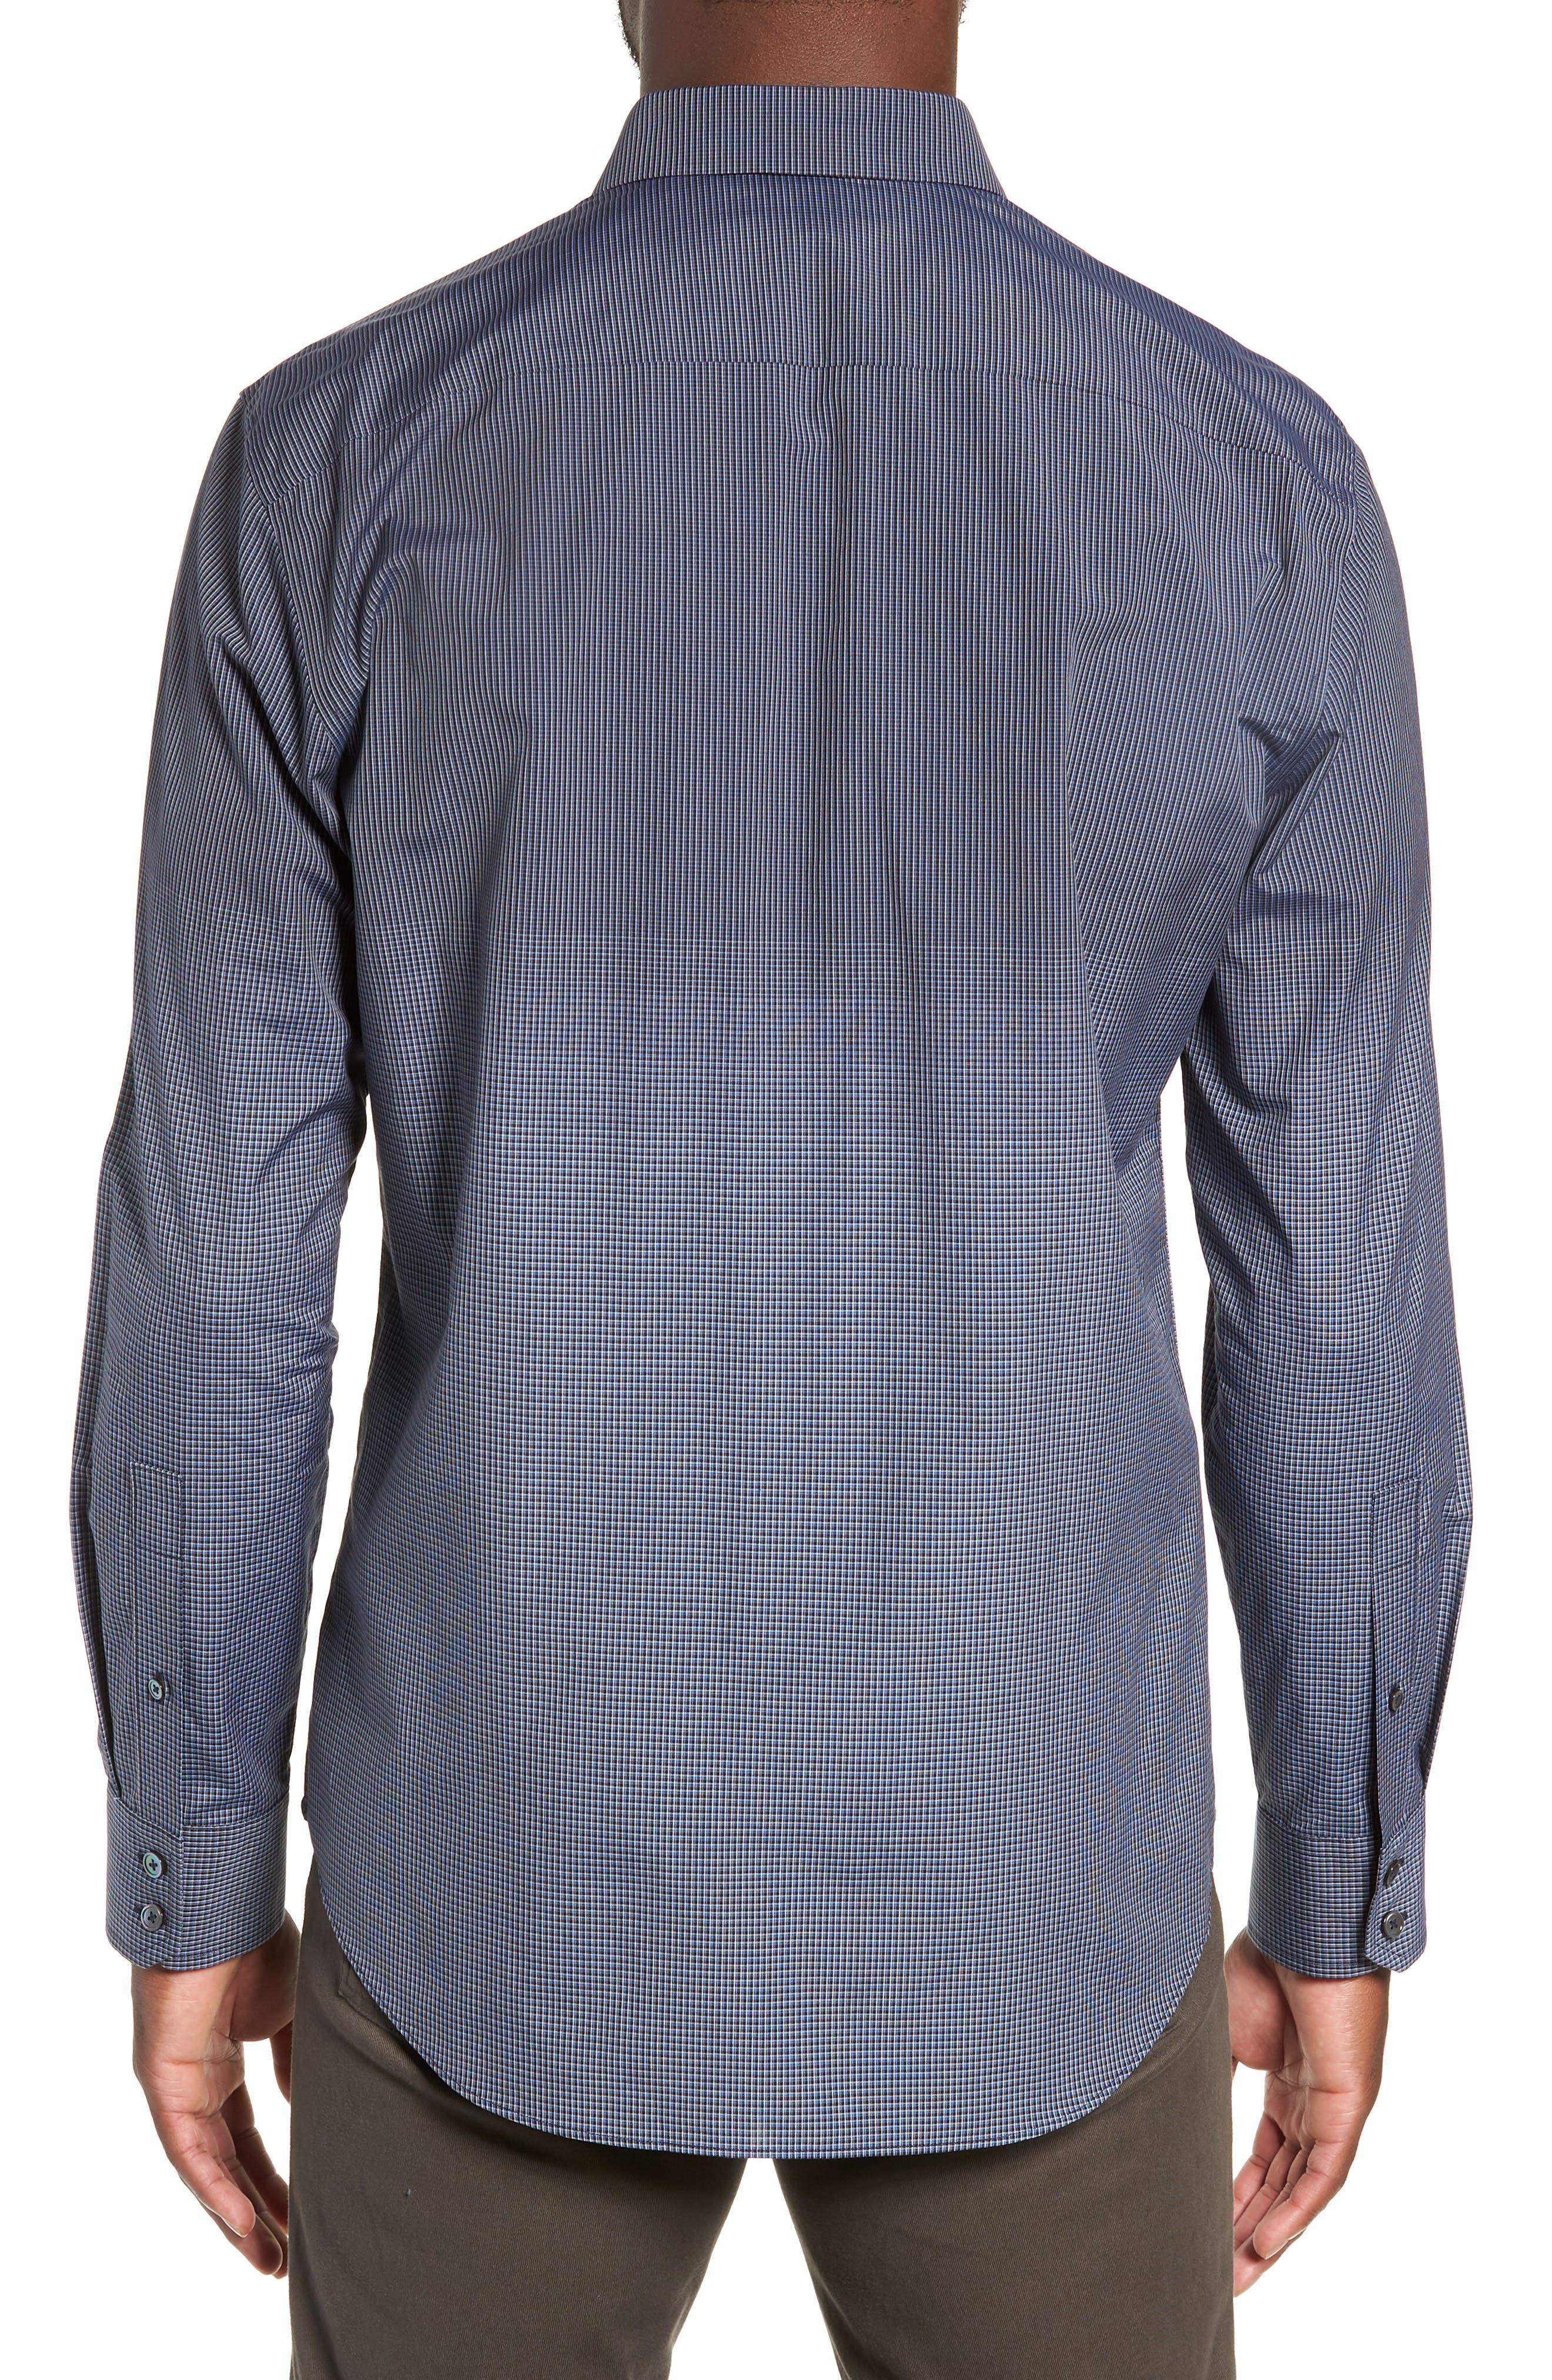 Hong Regular Fit Sport Shirt,                             Alternate thumbnail 3, color,                             NAVY